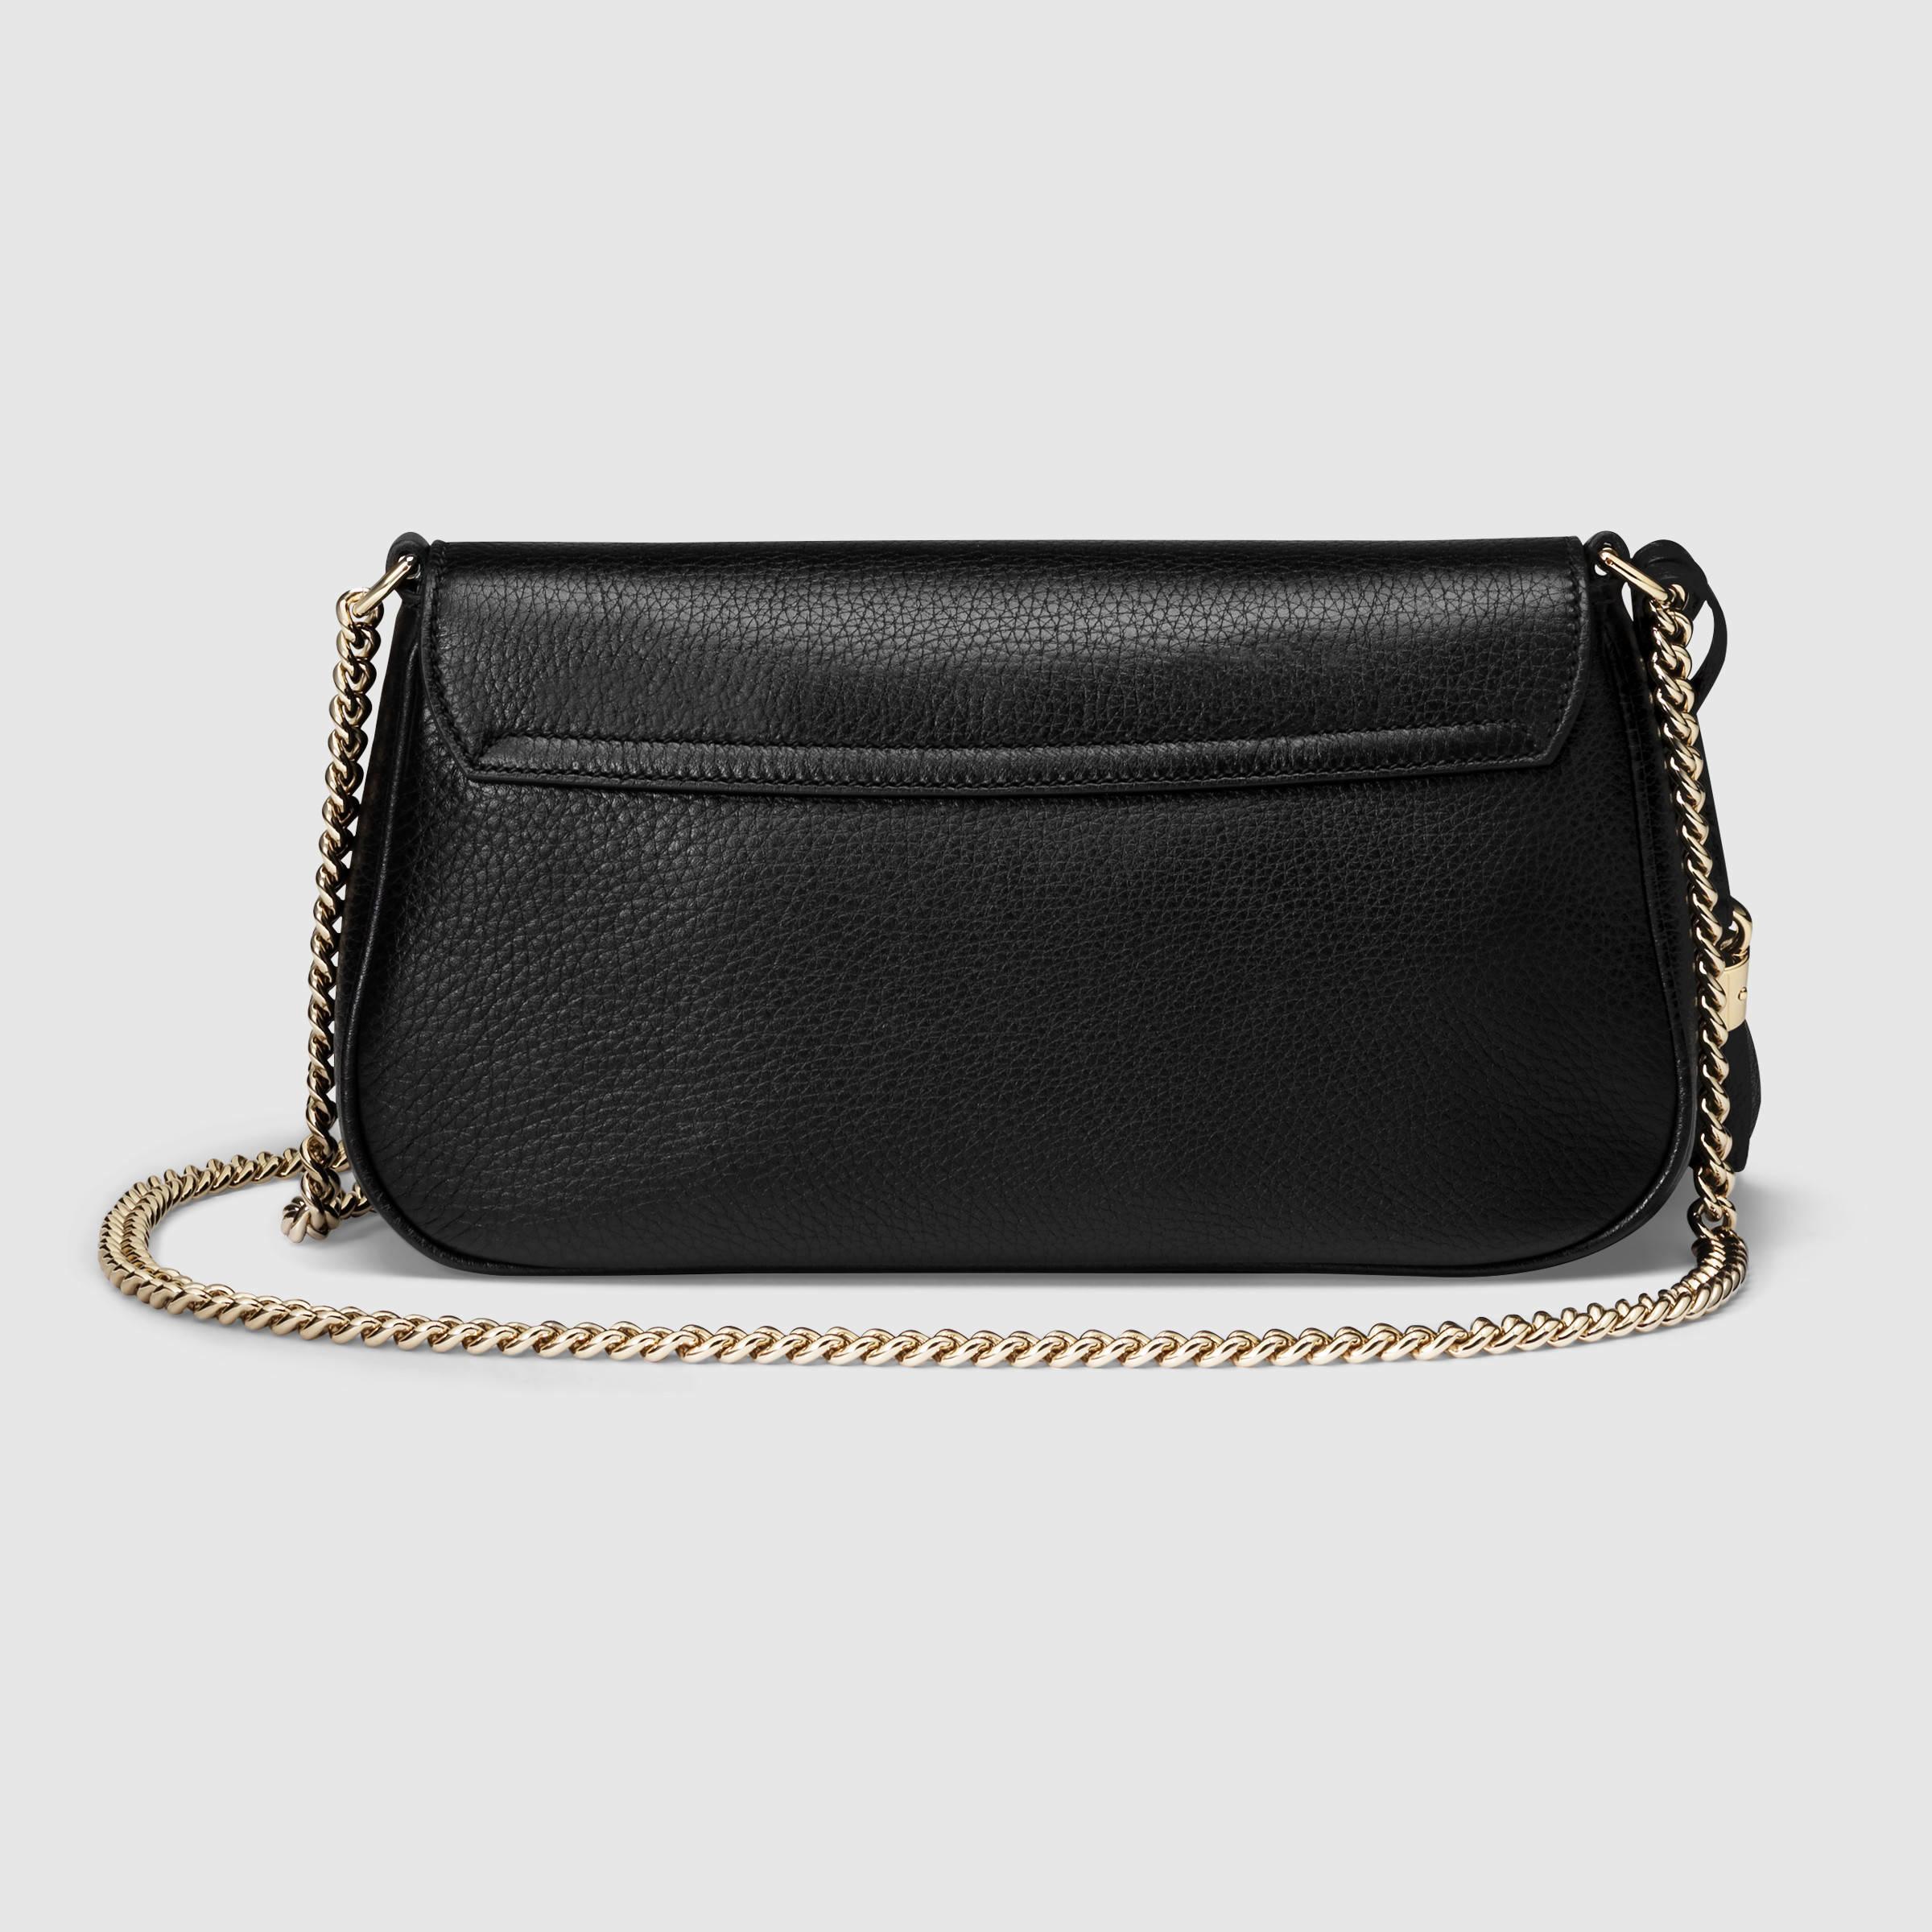 93590bdd891 Lyst - Gucci Soho Leather Shoulder Bag in Black